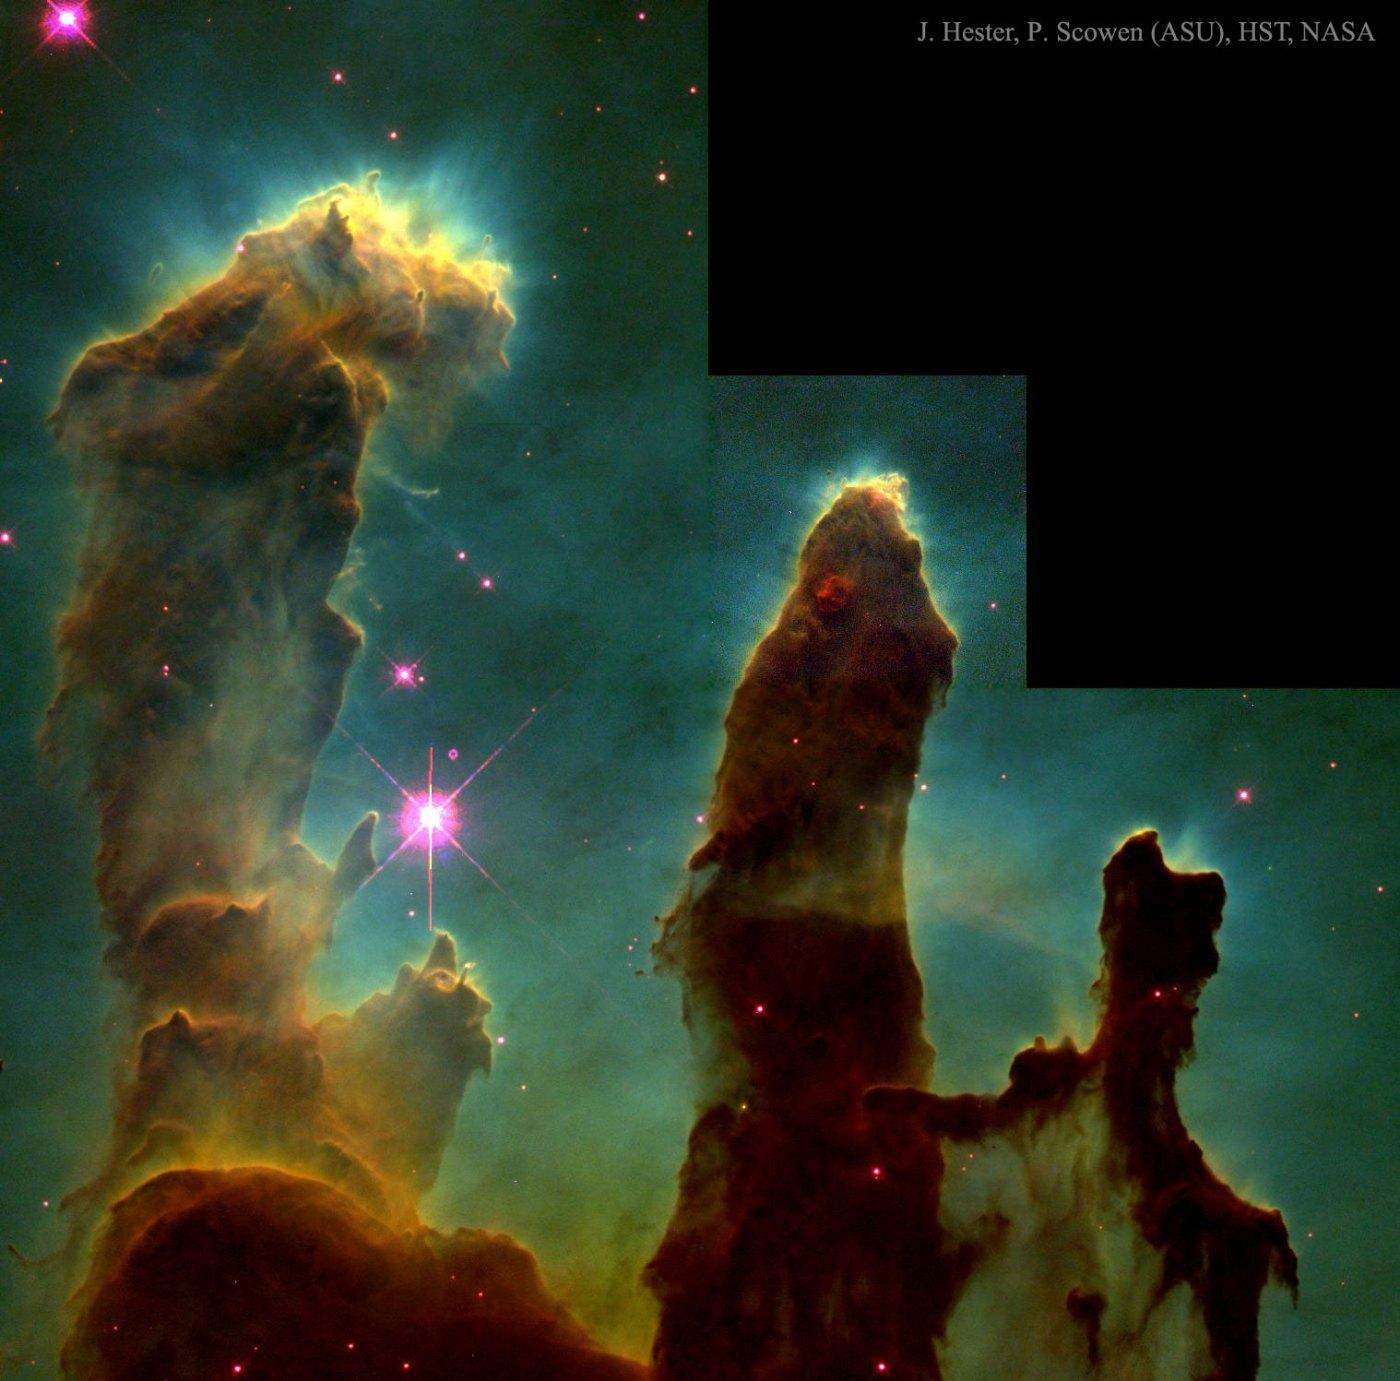 Pillars of Star Creation